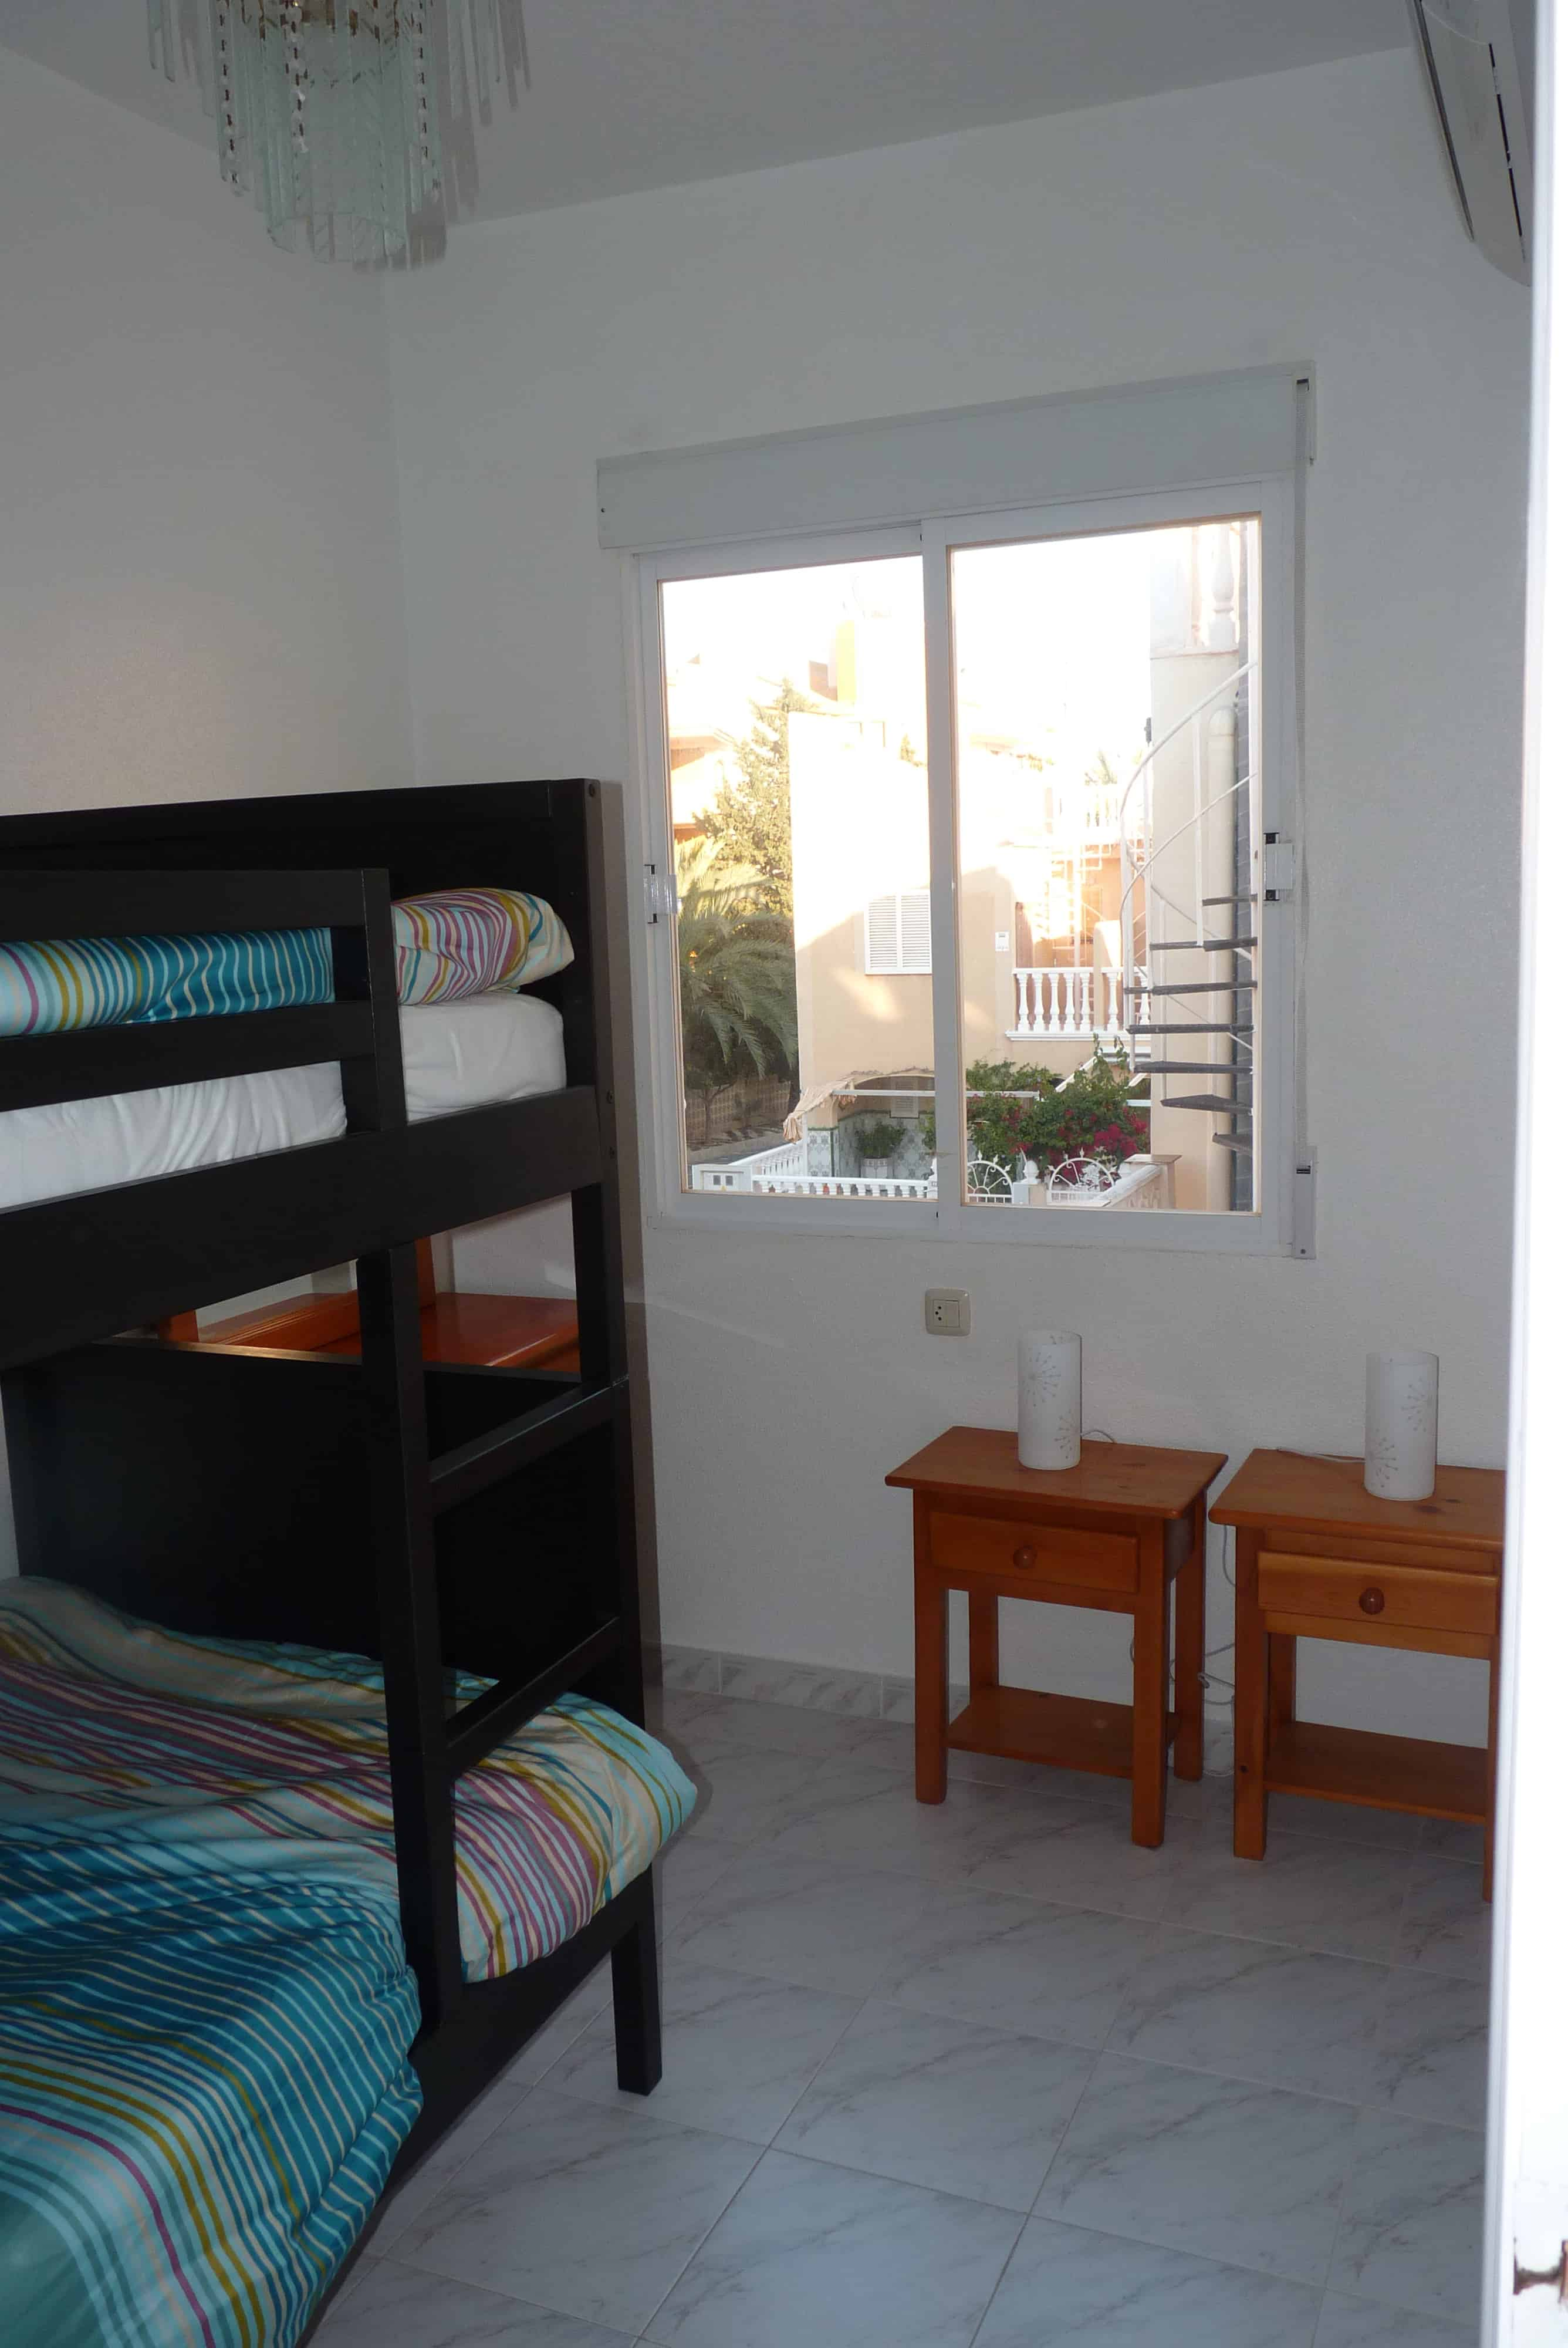 slaapkamer 3 - villagoleta, Deco ideeën